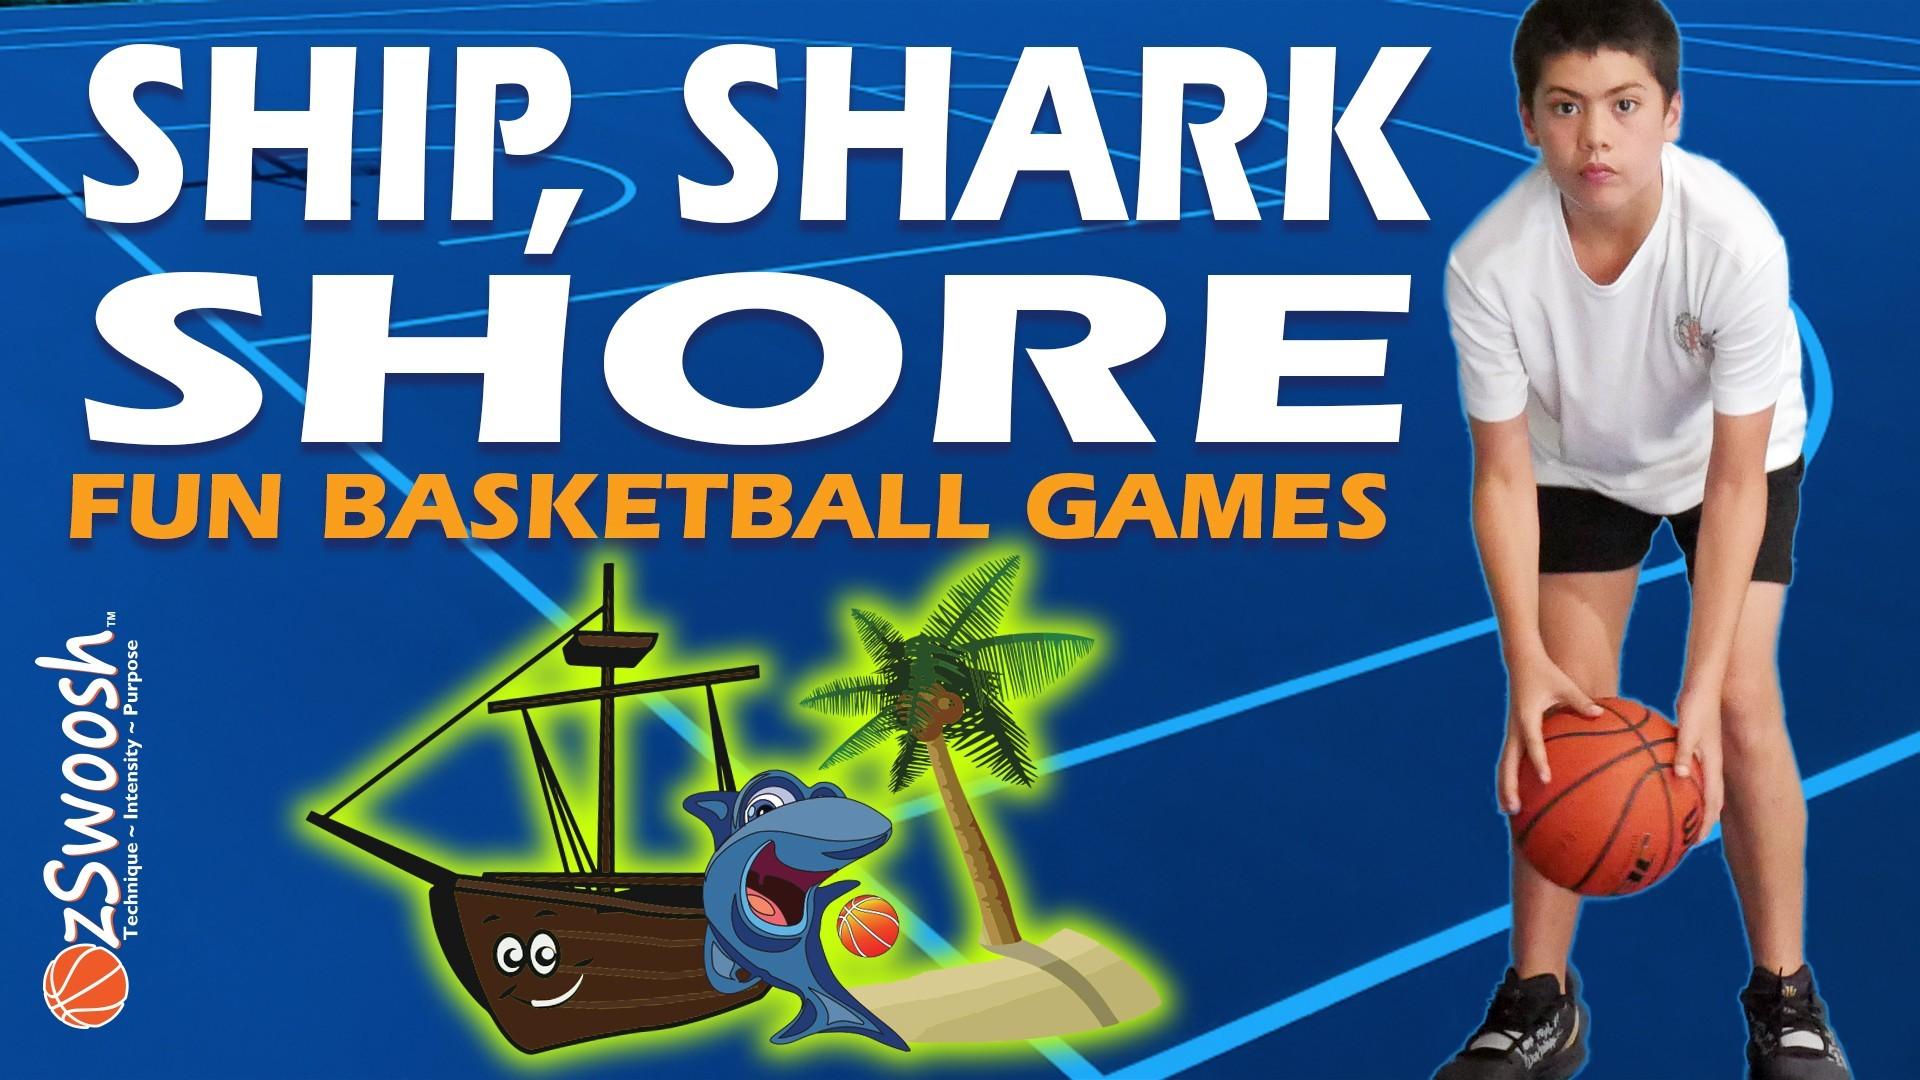 Fun Basketball Drill For Kids - Ship Shark Shore (Dribbling Game)